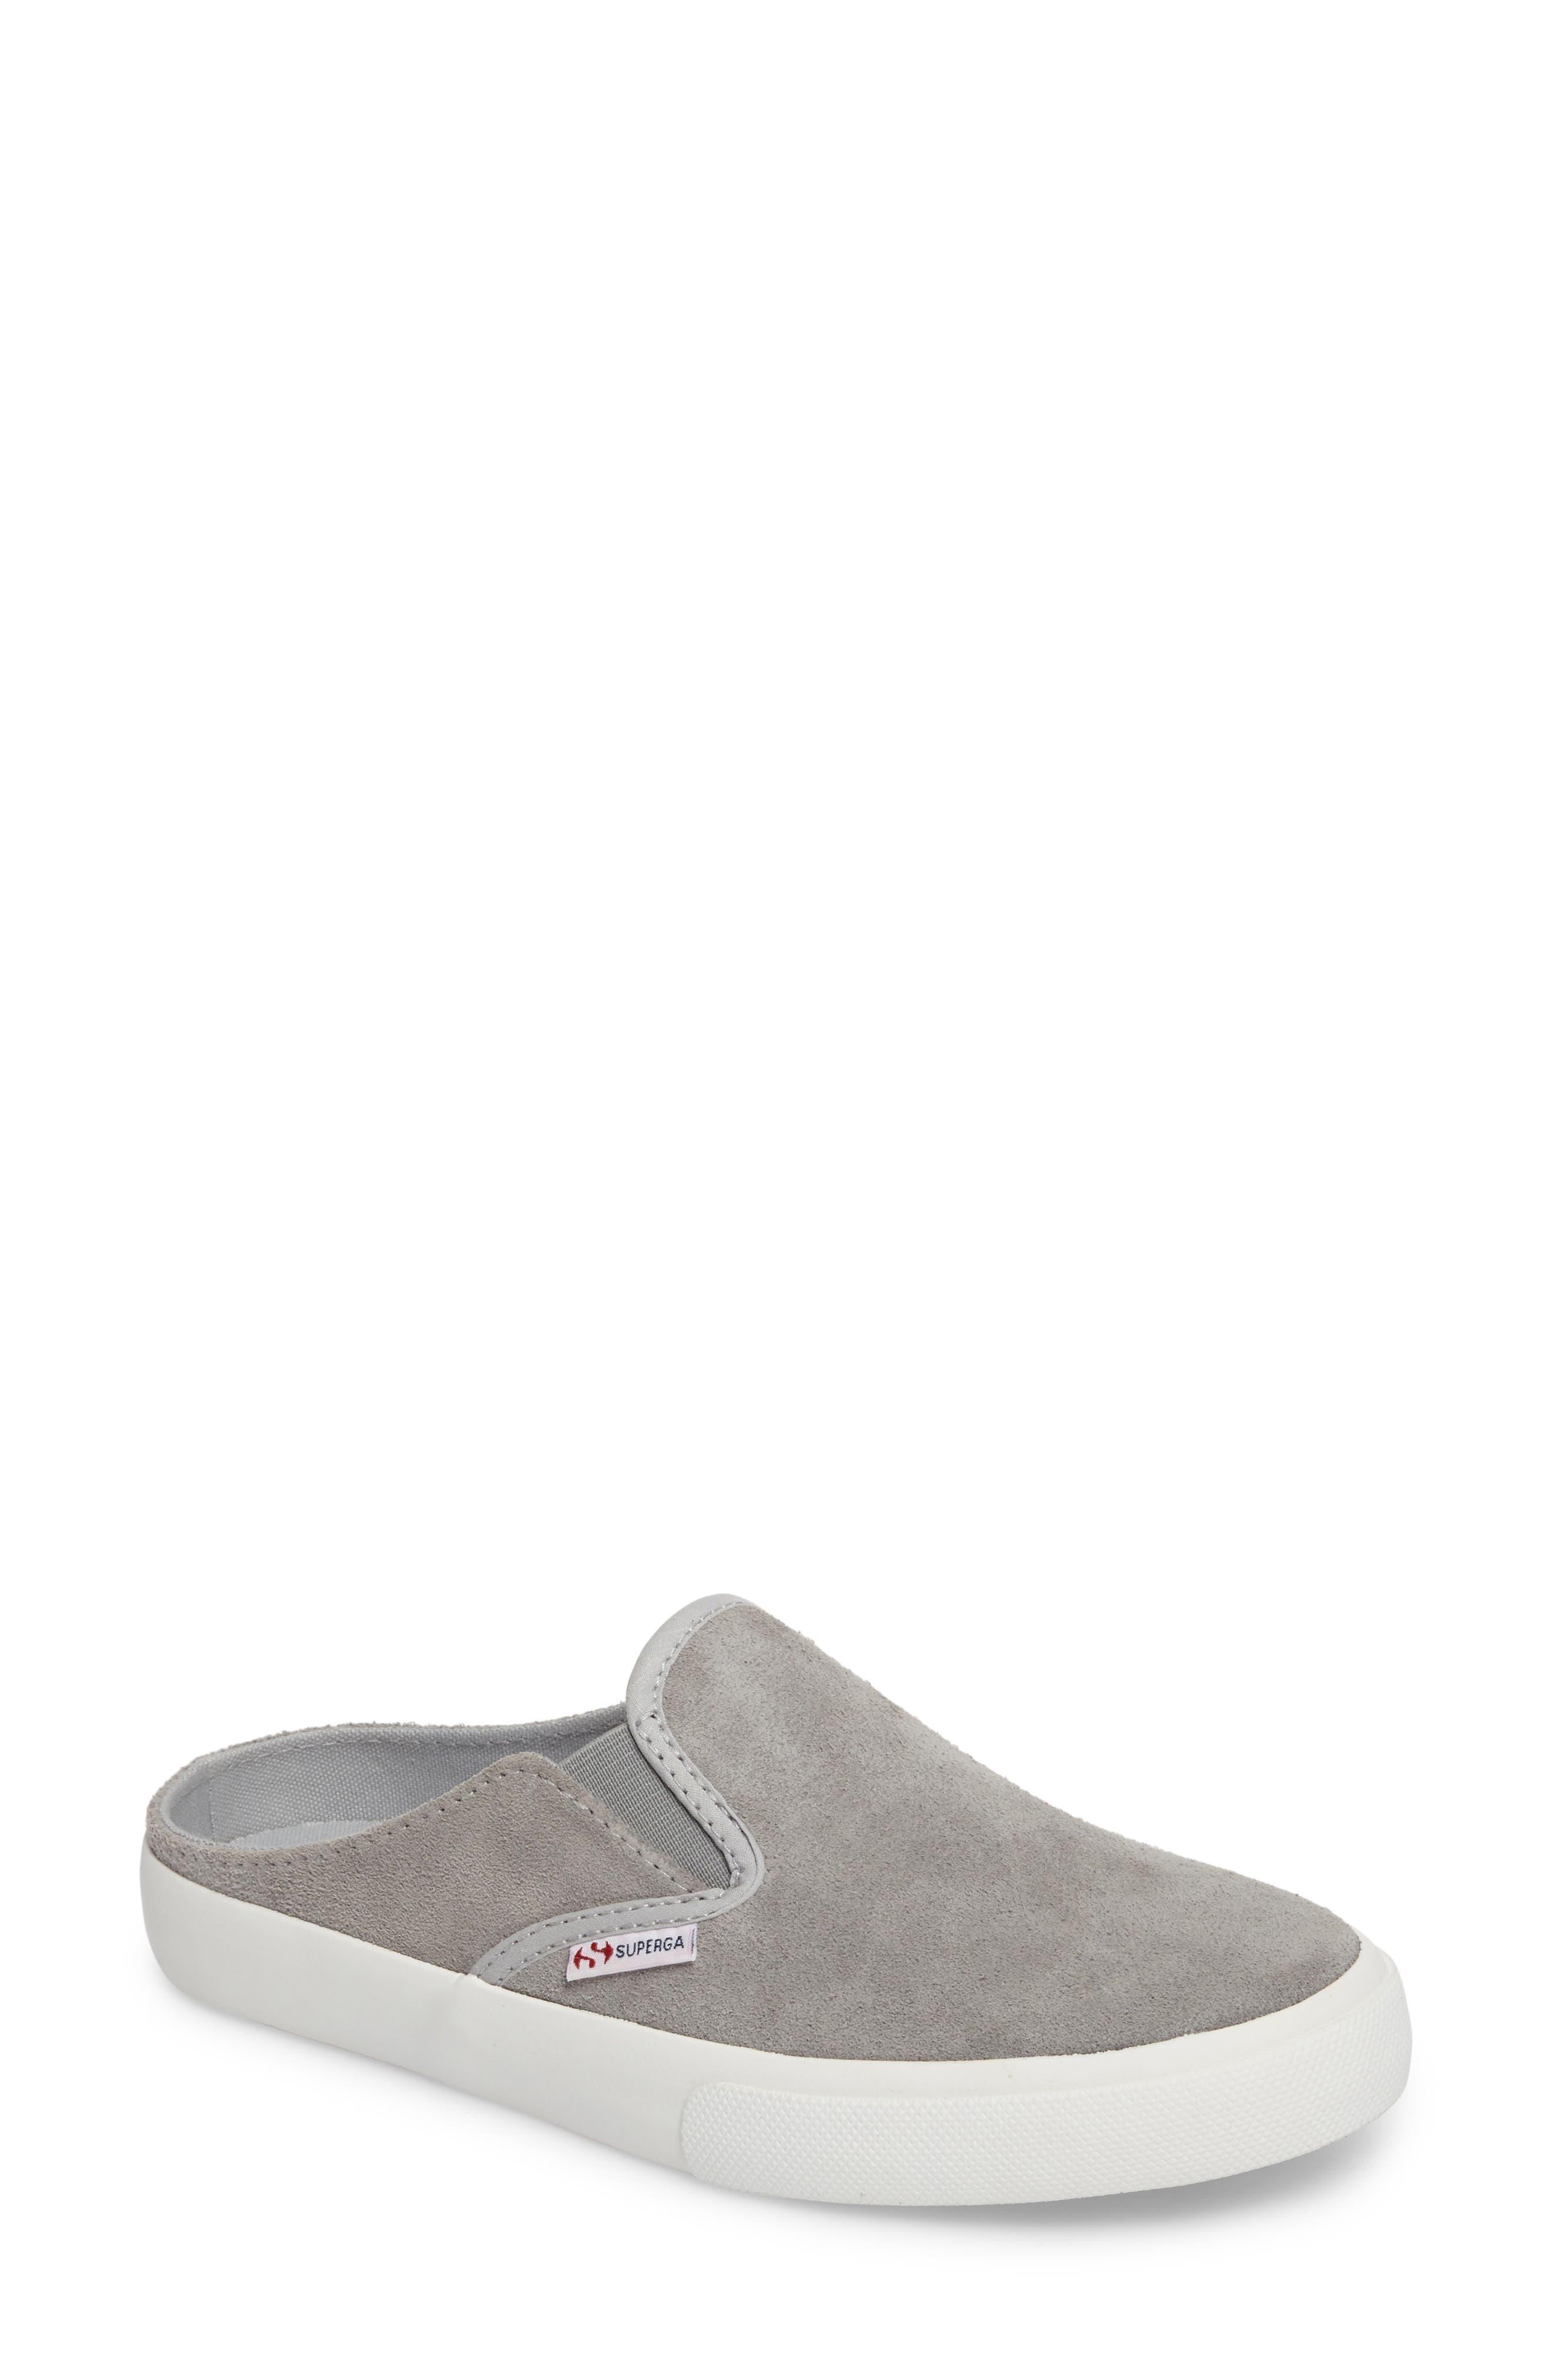 Main Image - Superga Slip-On Mule Sneaker (Women)